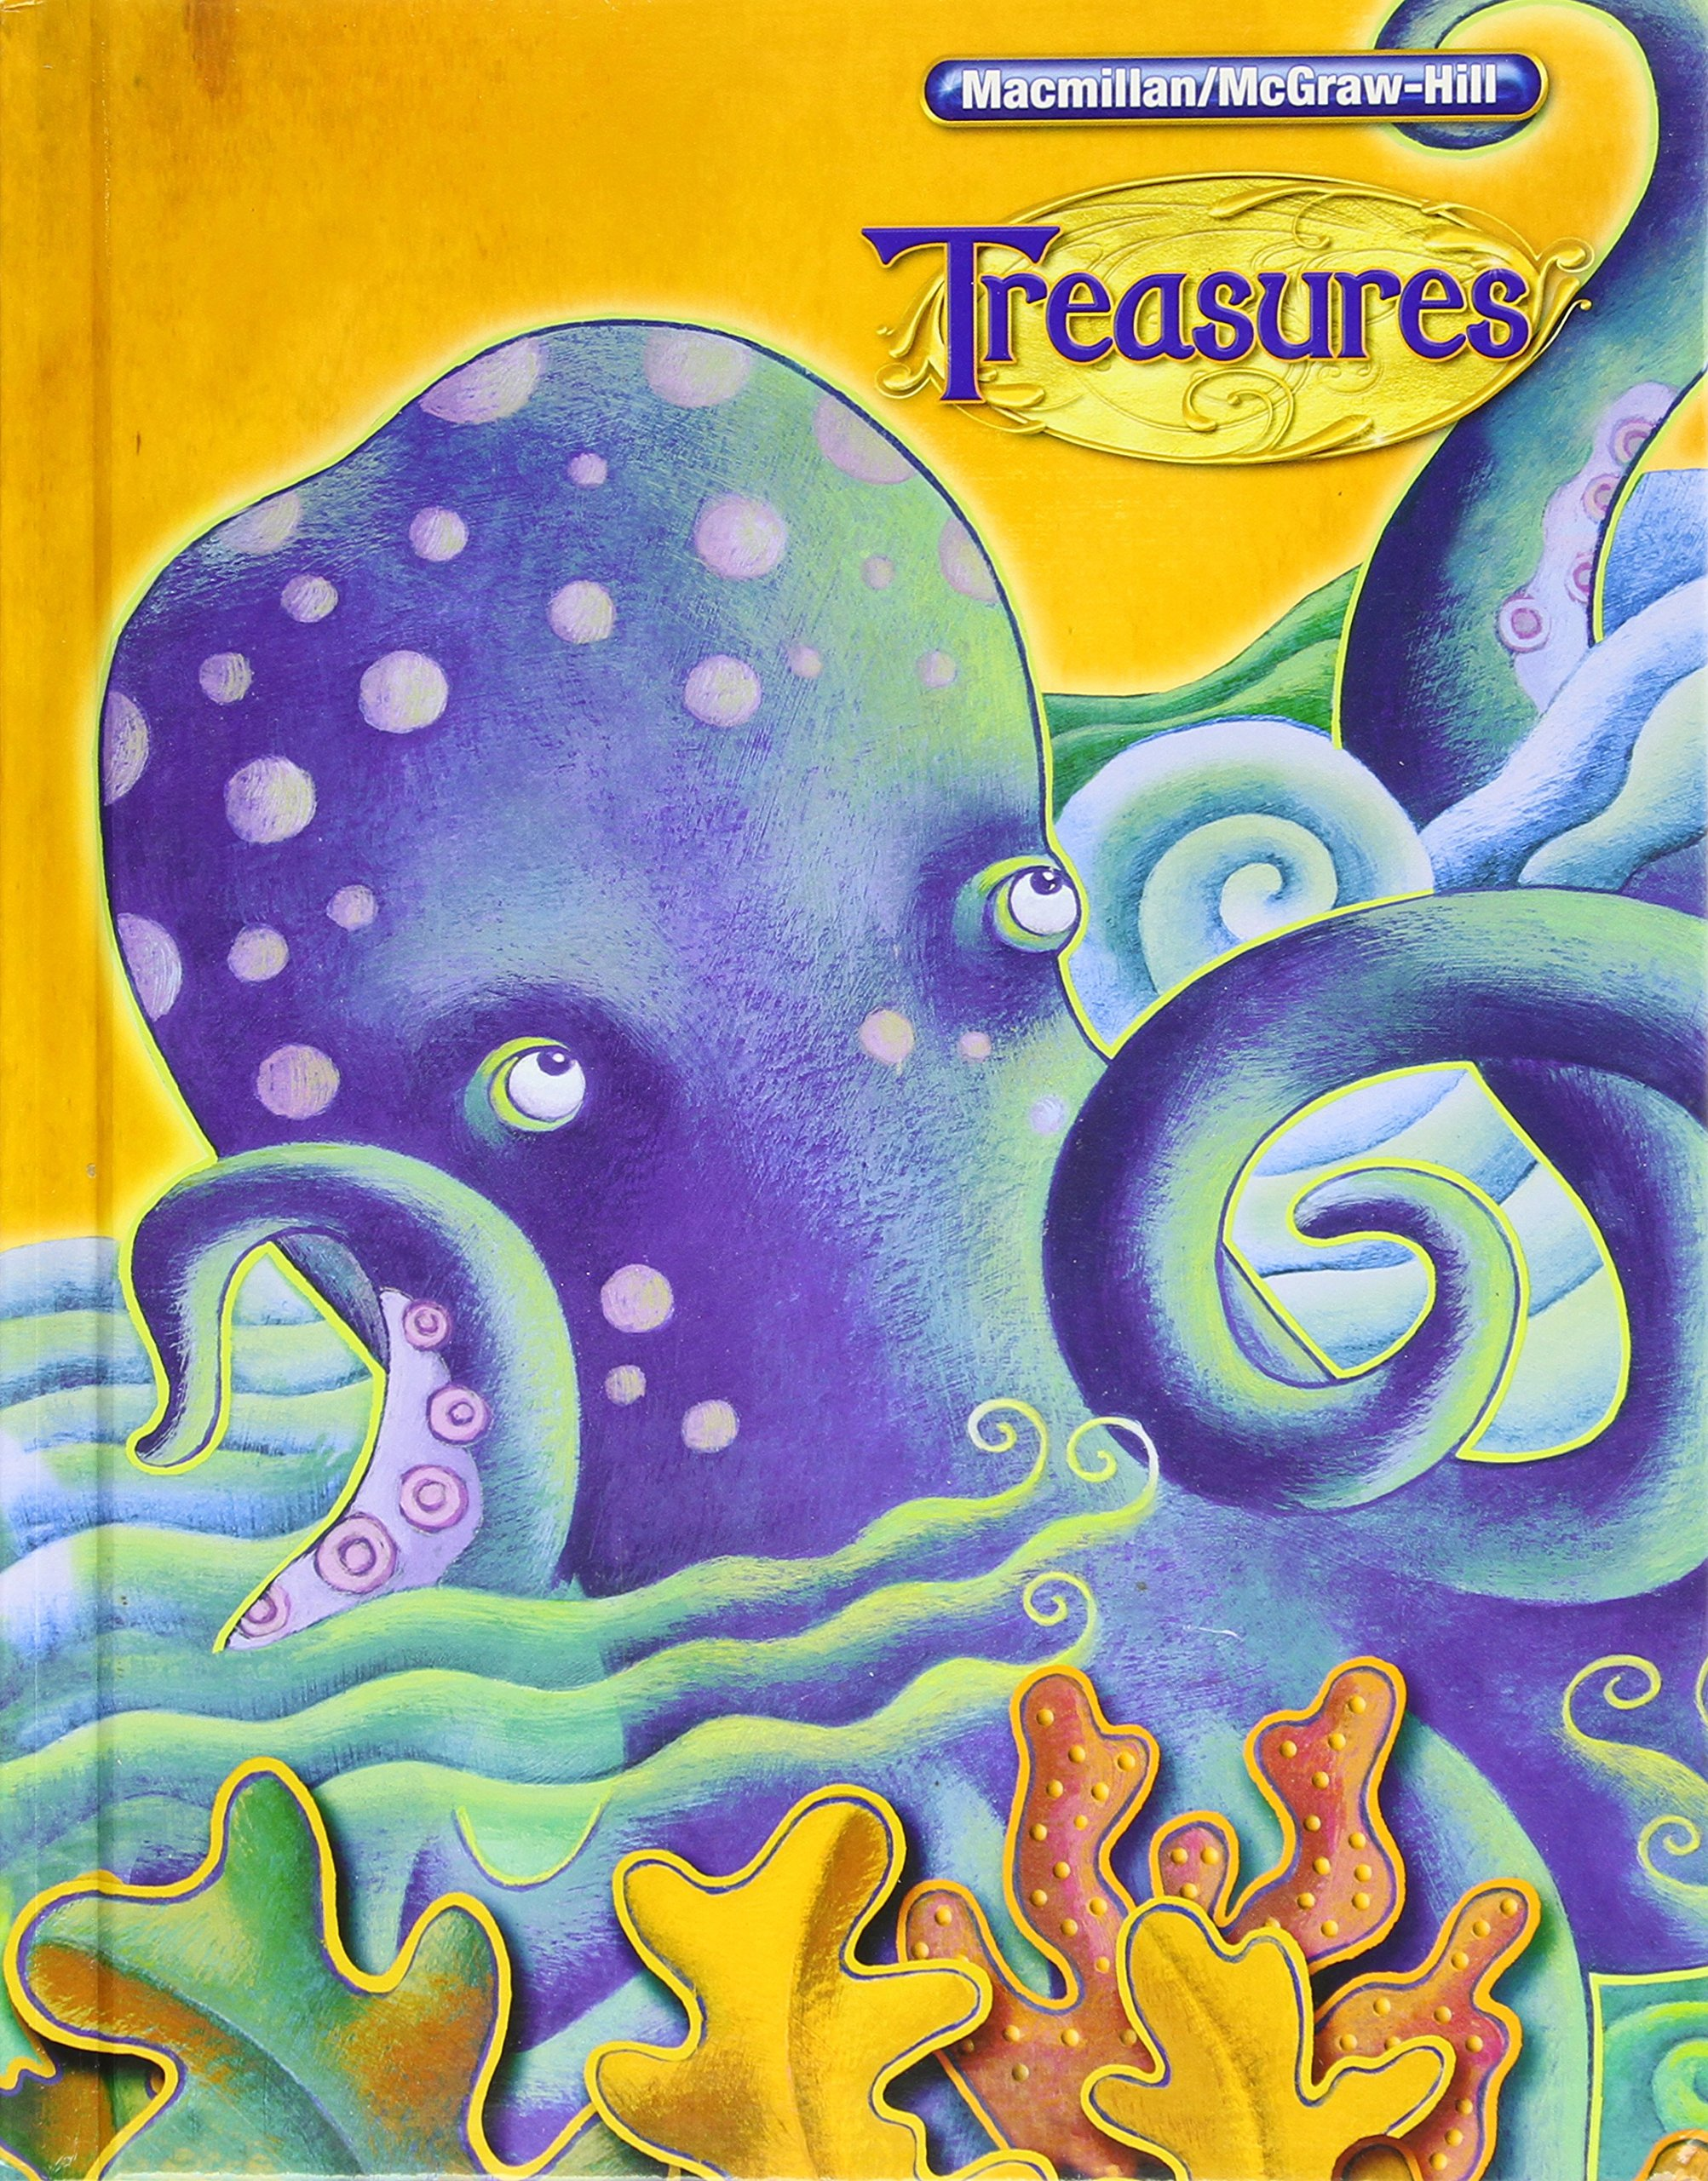 Buy Macmillan/McGraw-Hill Treasures, A Reading/Language Arts